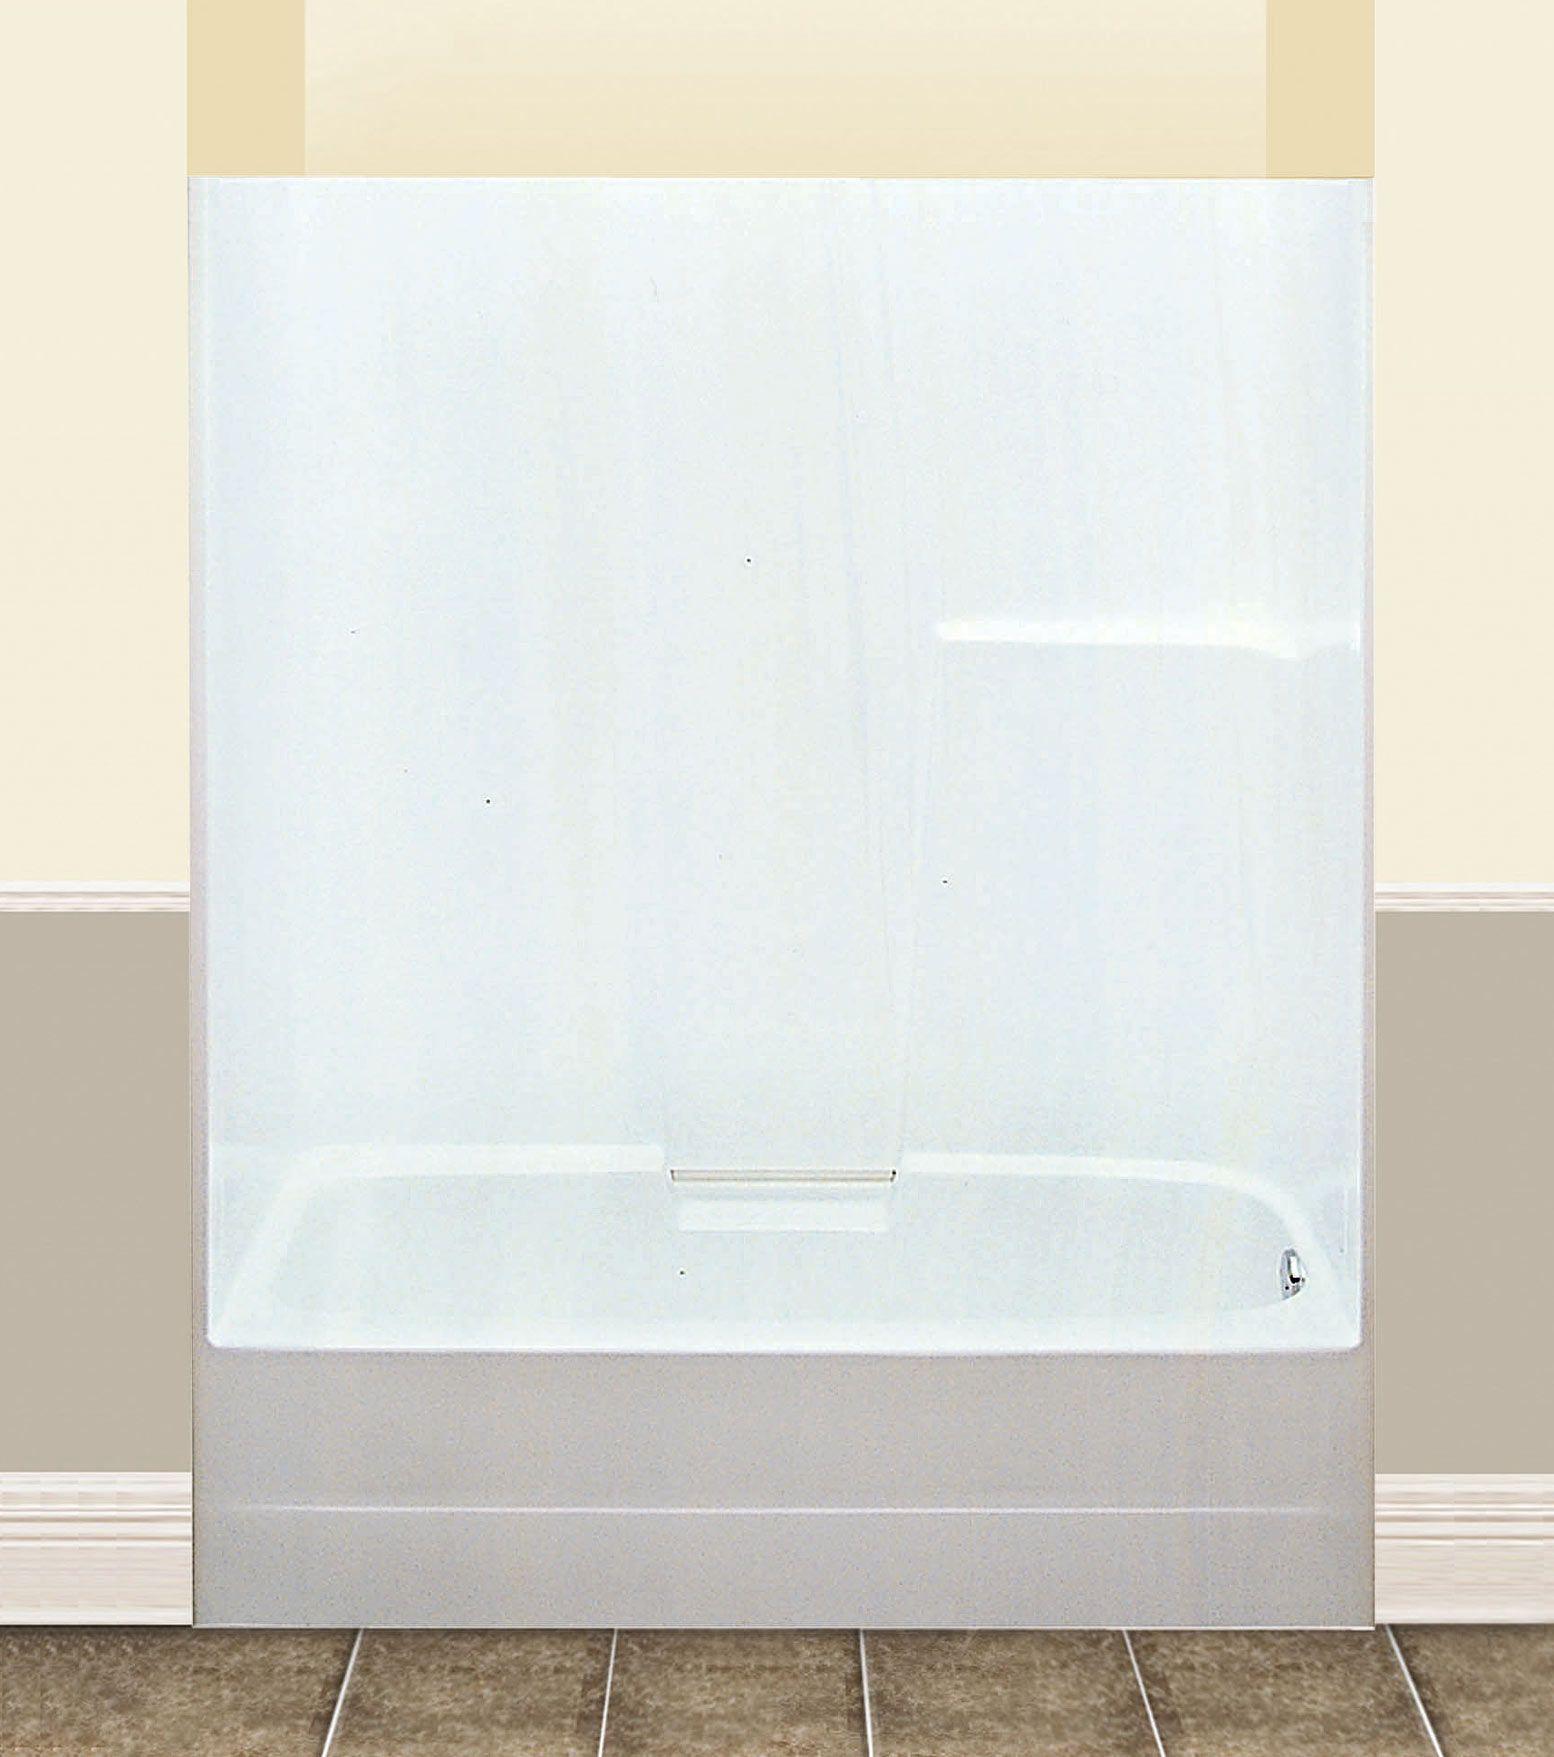 Banff 60/60S Alcove or Tub showers bathtub - Advanta by MAAX ...